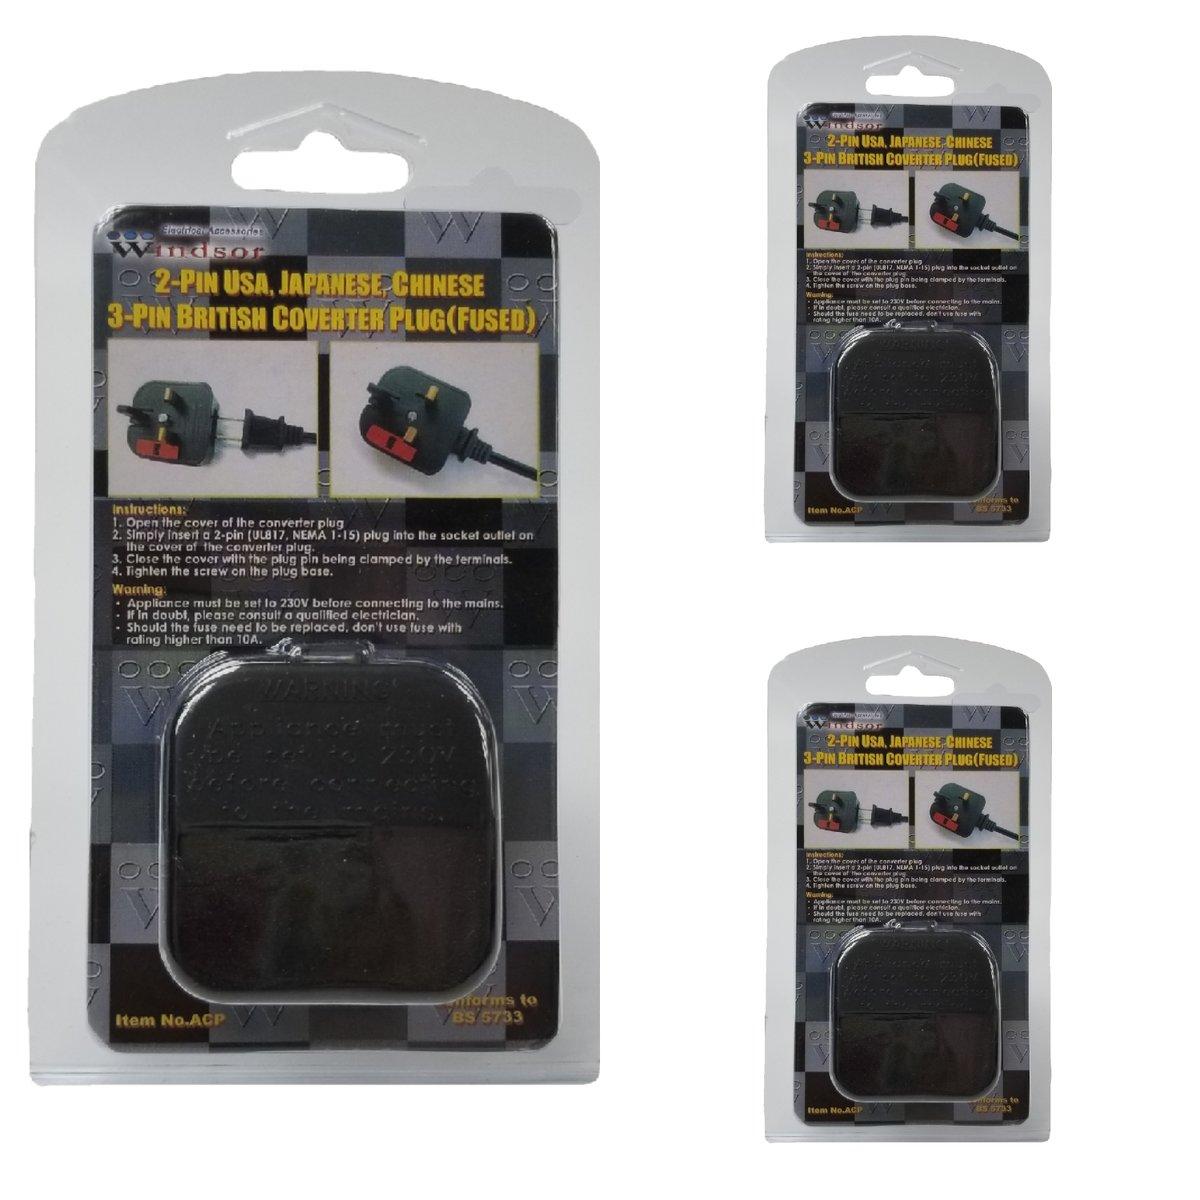 2-Pin USA, Japanese, Chinese to 3 Pin British Converter Plug - 3 Pack